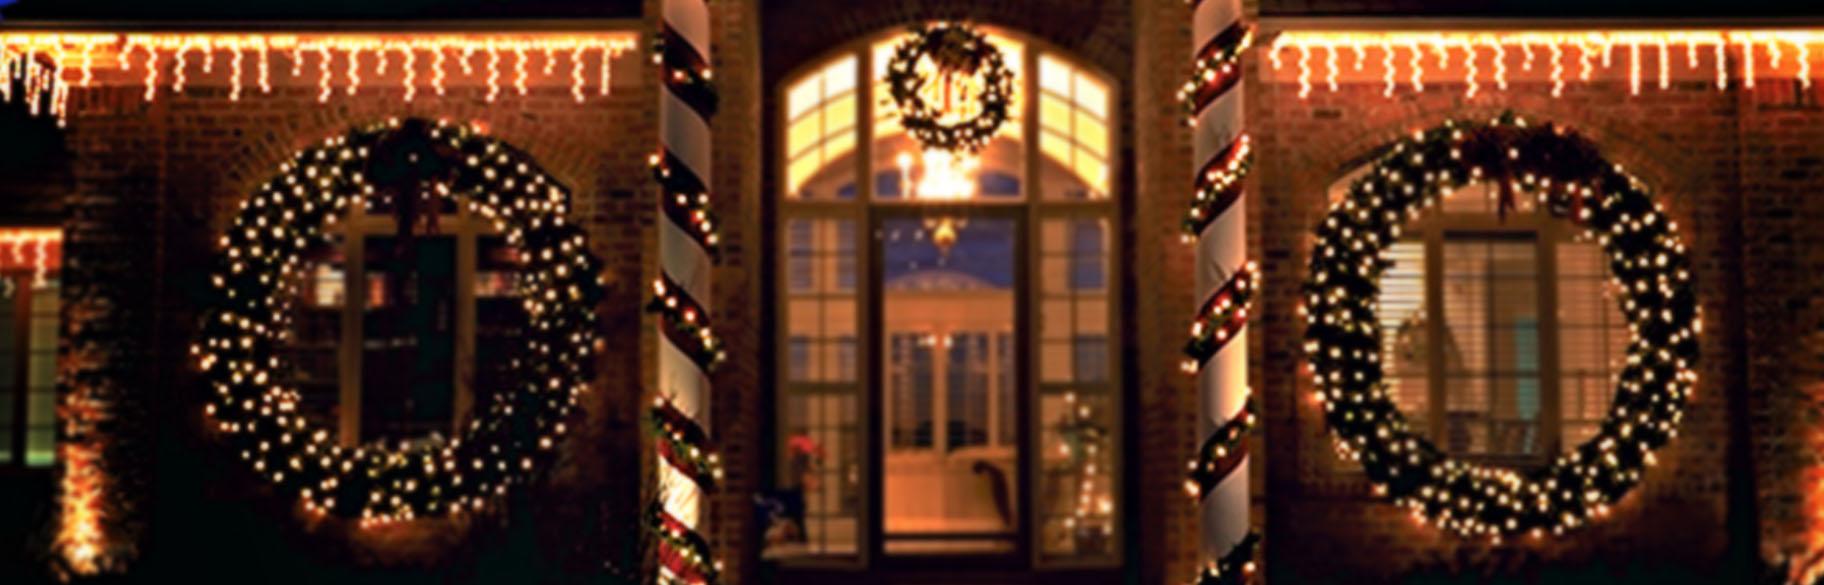 Holiday Lighting 5